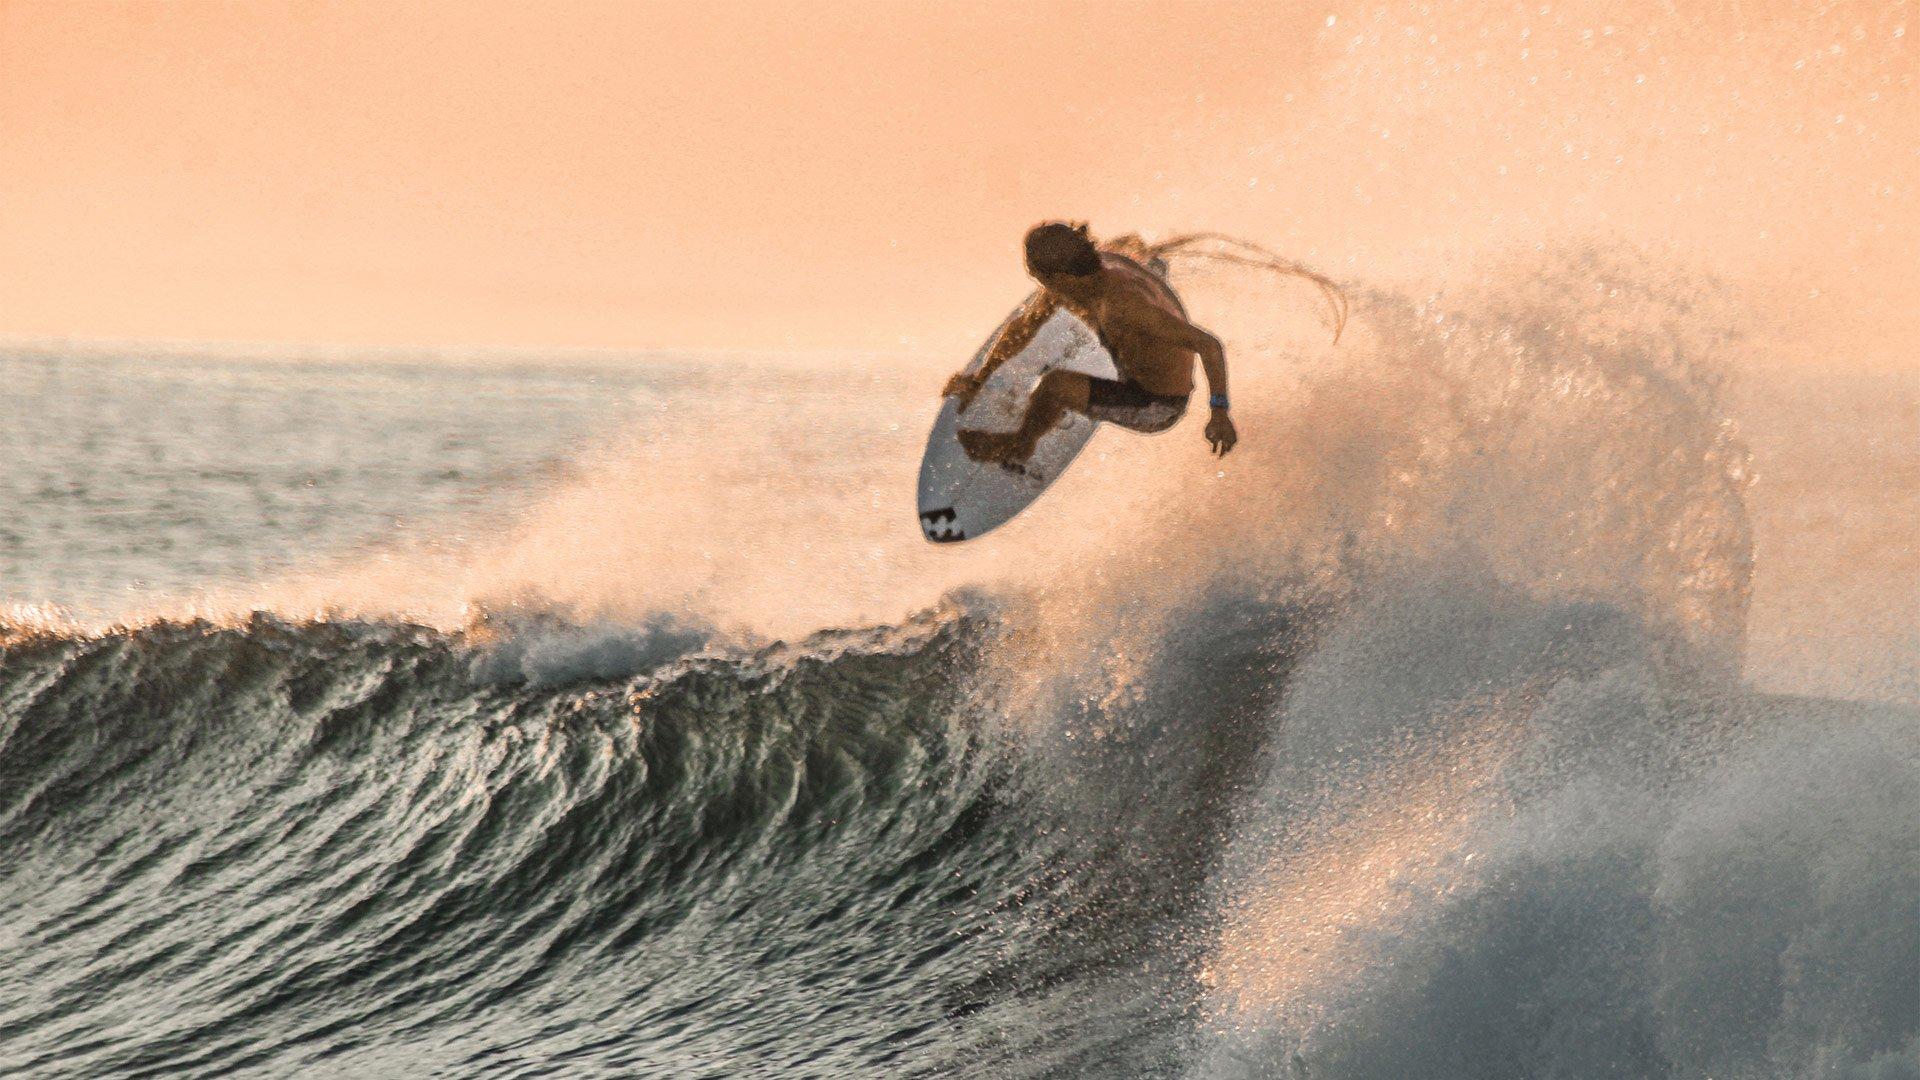 Surfing Prodigy Bryan Perez Joins Hype Energy's Athlete Team